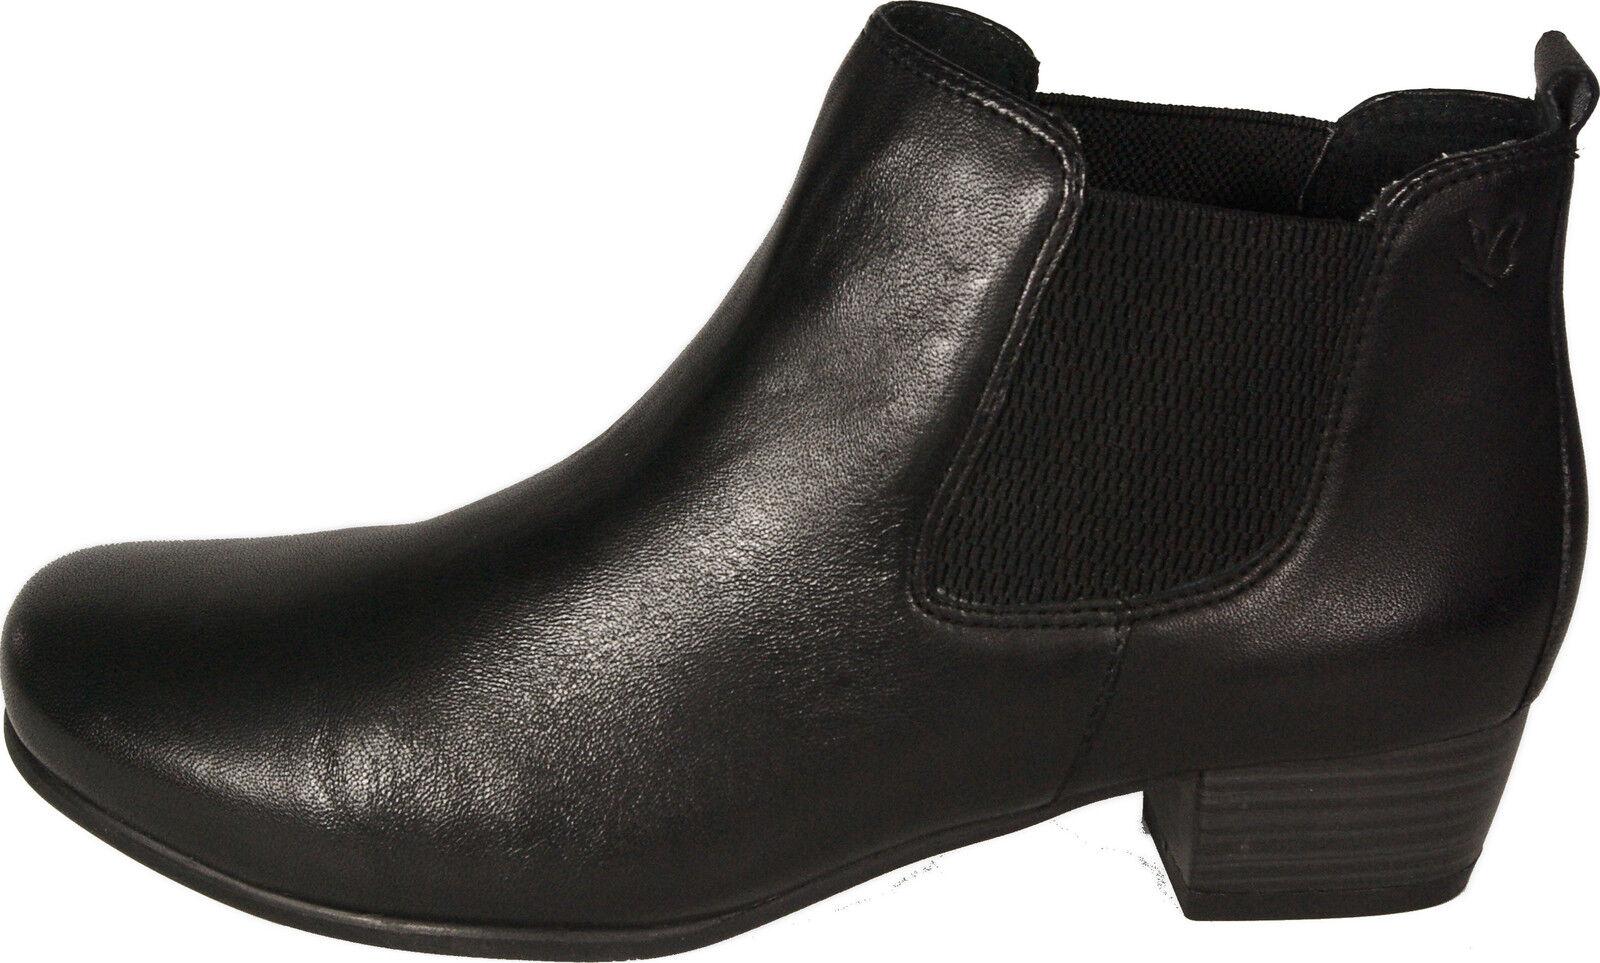 Caprice zapatos chelsea botas botines negro cuero genuino nuevo cremallera